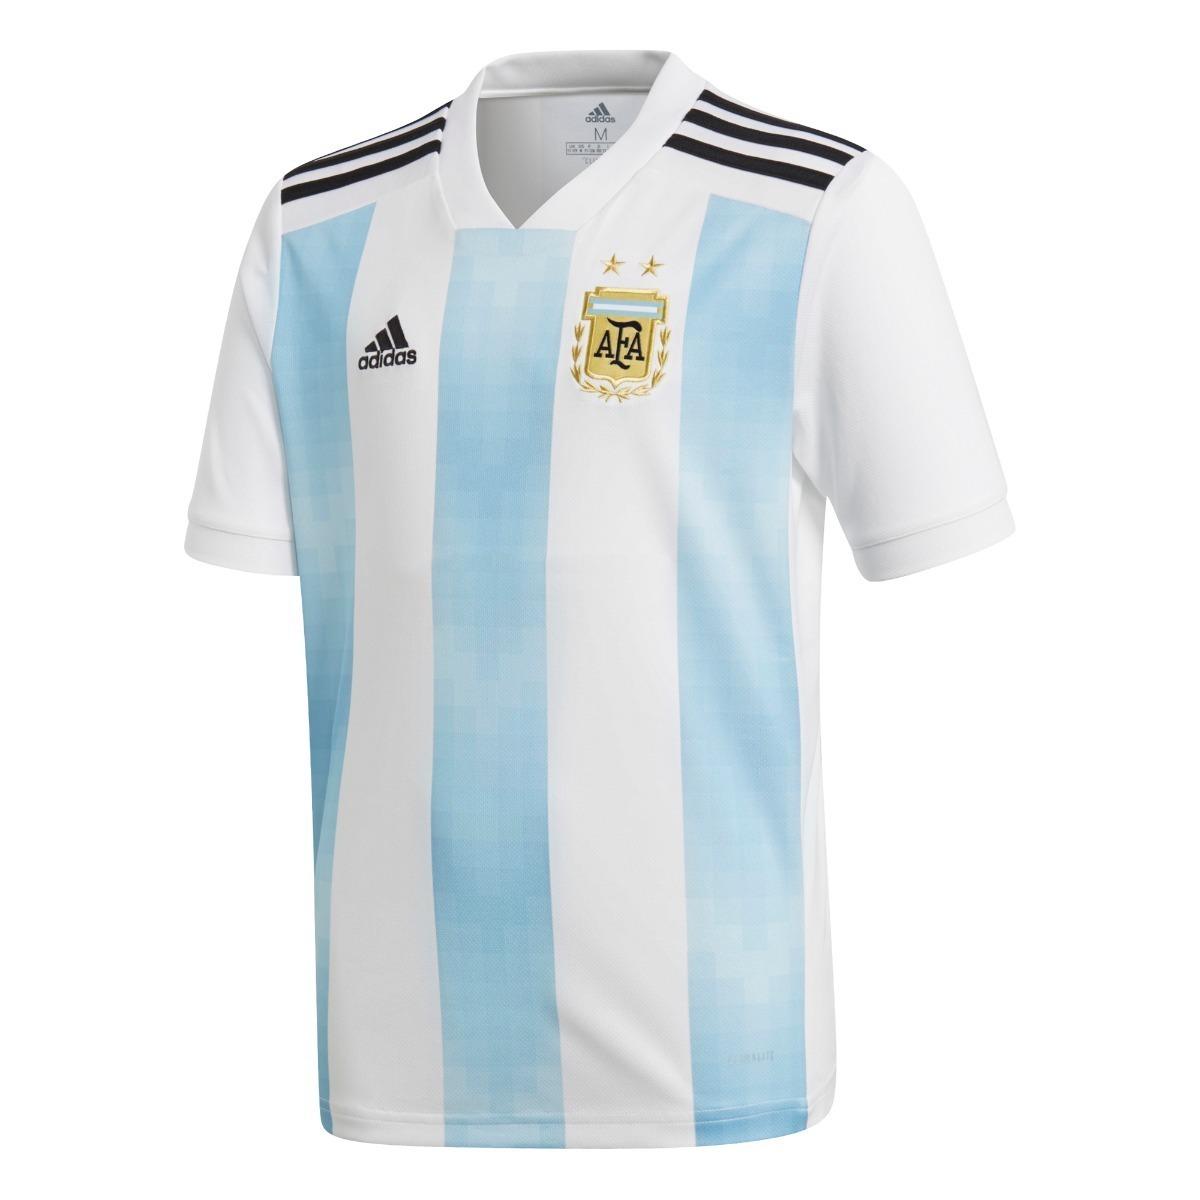 Argentina Camiseta Climacool 999 2018 00 Adidas Seleccion Hombre 8AwTSv8